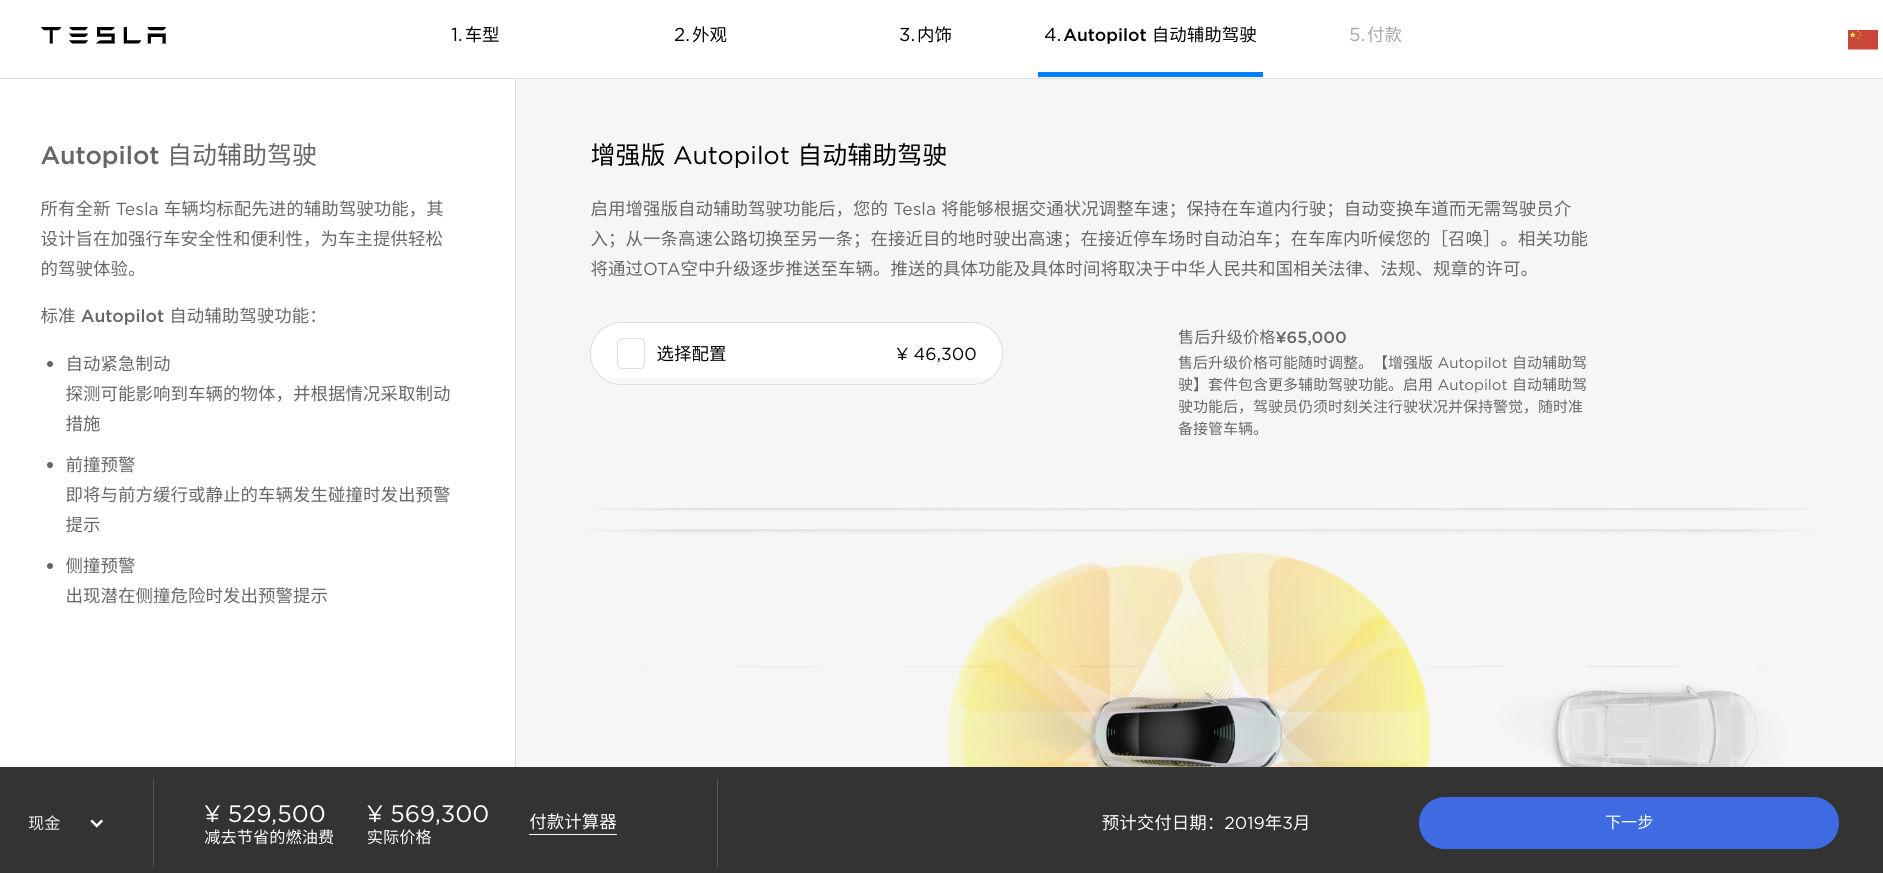 model-3-configurator-china-autopilot